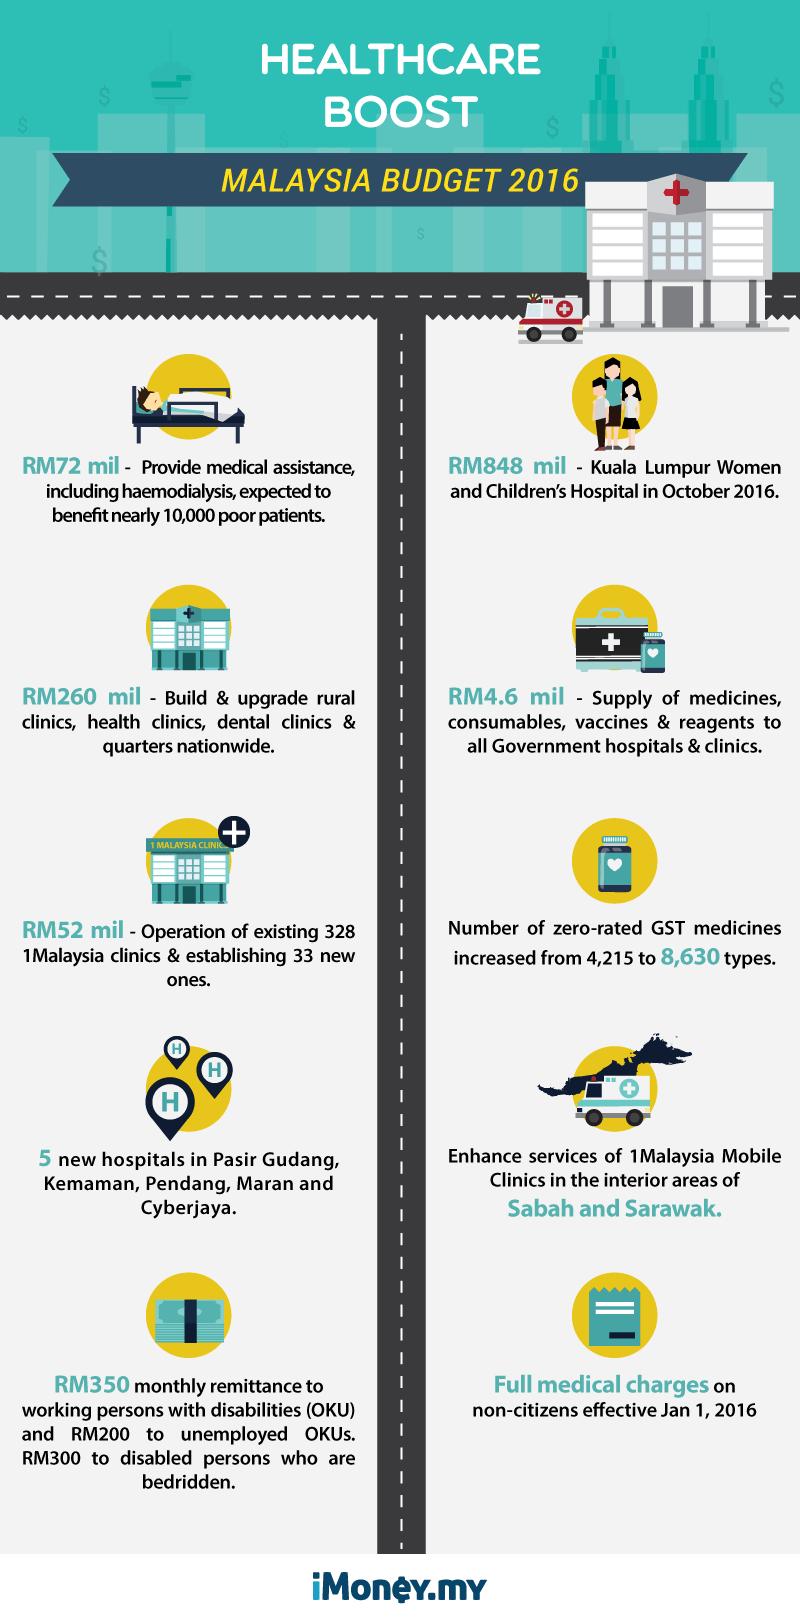 Malaysia budget 2016